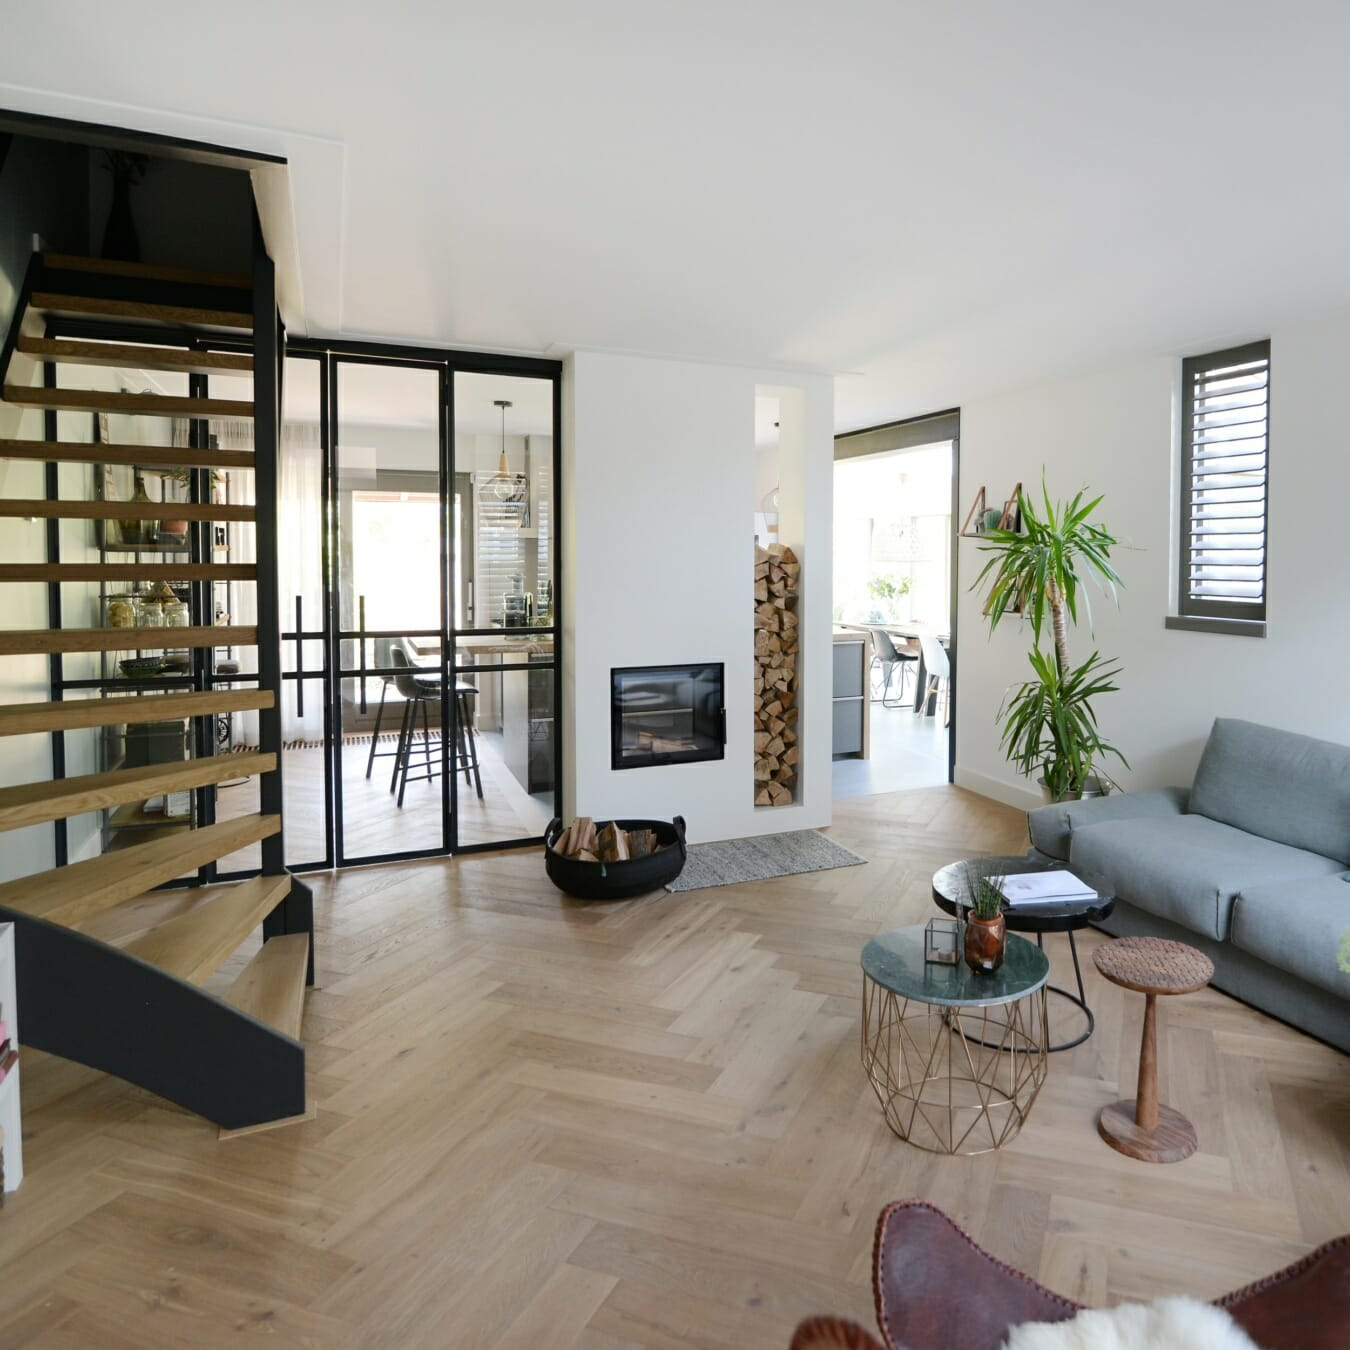 Piet boon shutters klein raam woonkamer